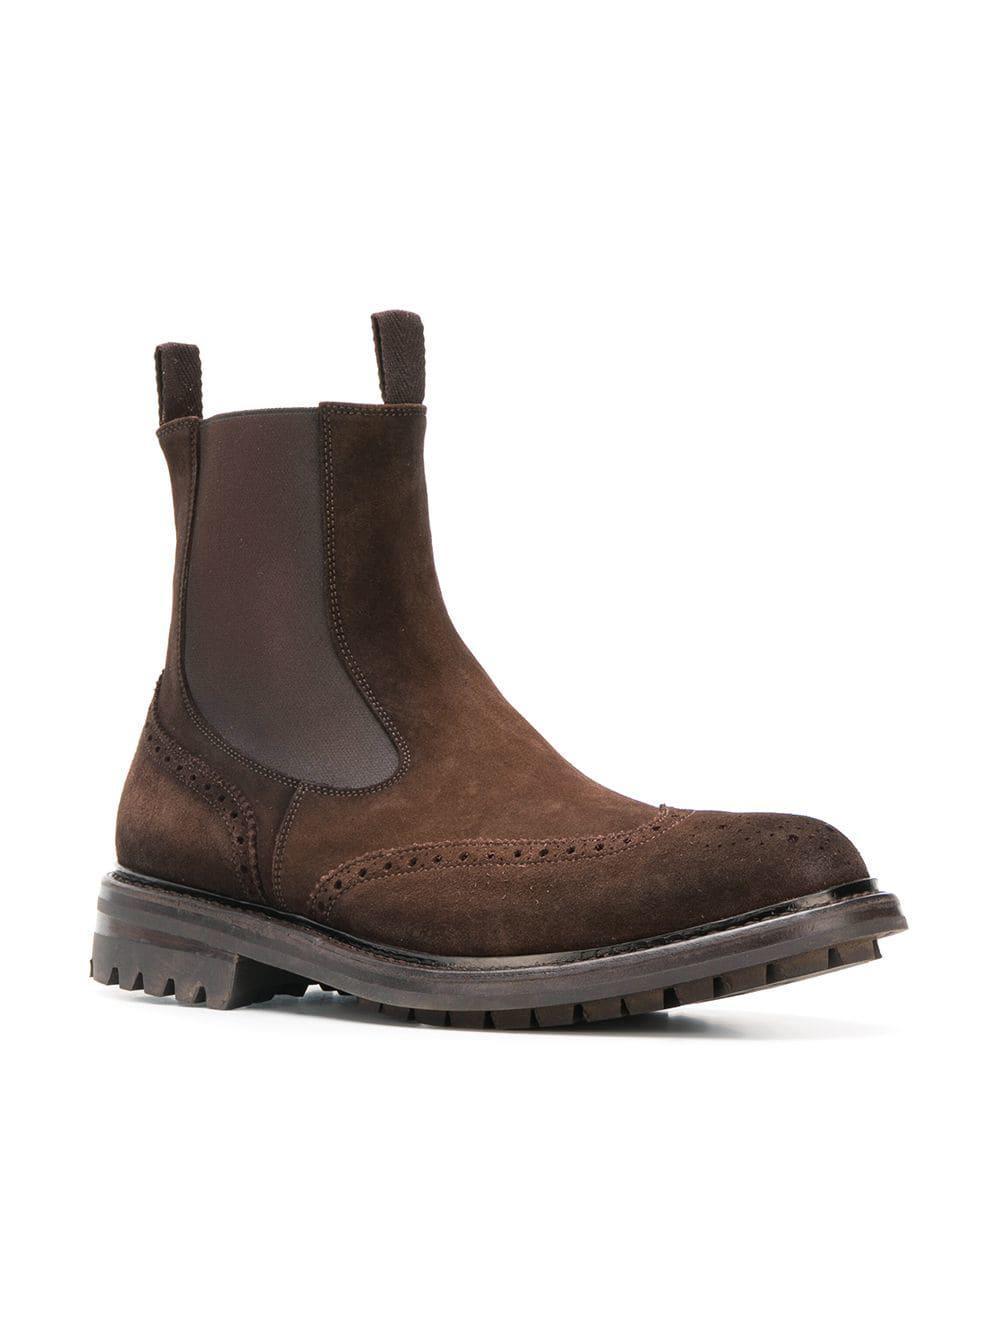 a386d45ea6de4 Lyst - Officine Creative Exeter Chelsea Boots in Brown for Men